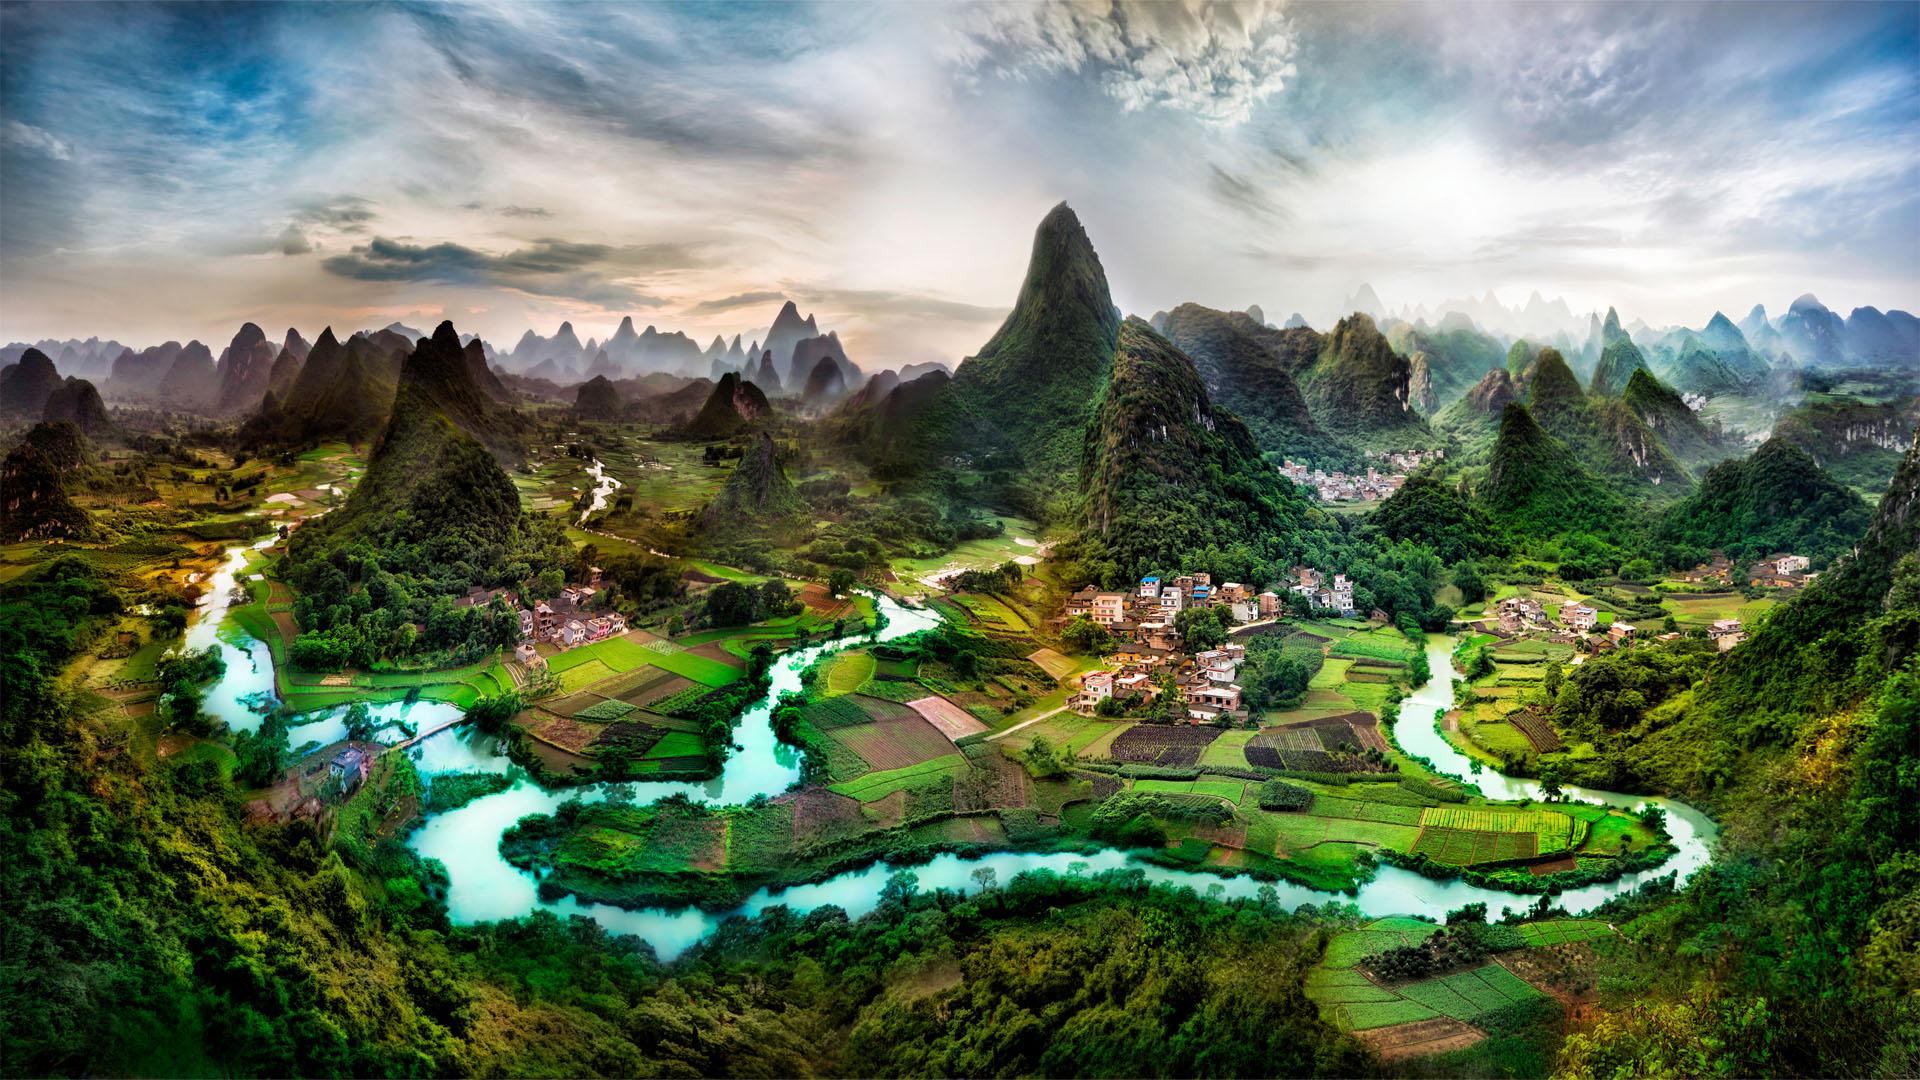 Beautiful Landscape Desktop Background Wallpaper - DreamLoveWallpapers